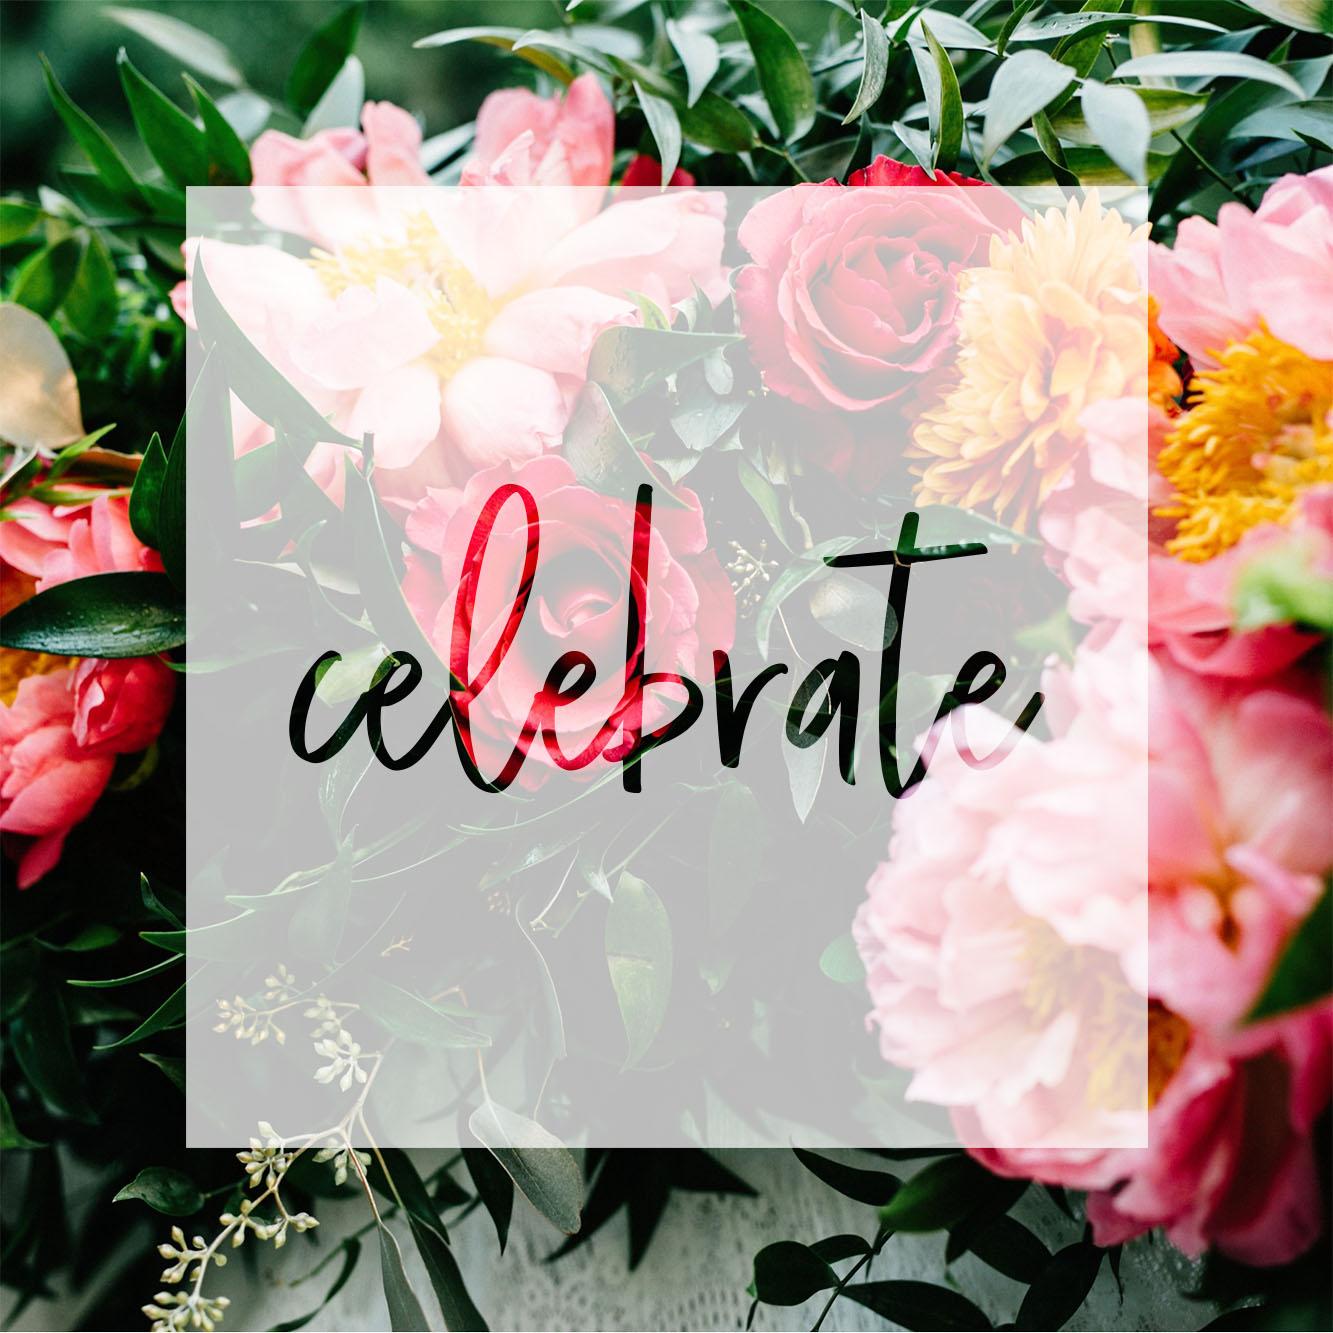 celebrate_button.jpg